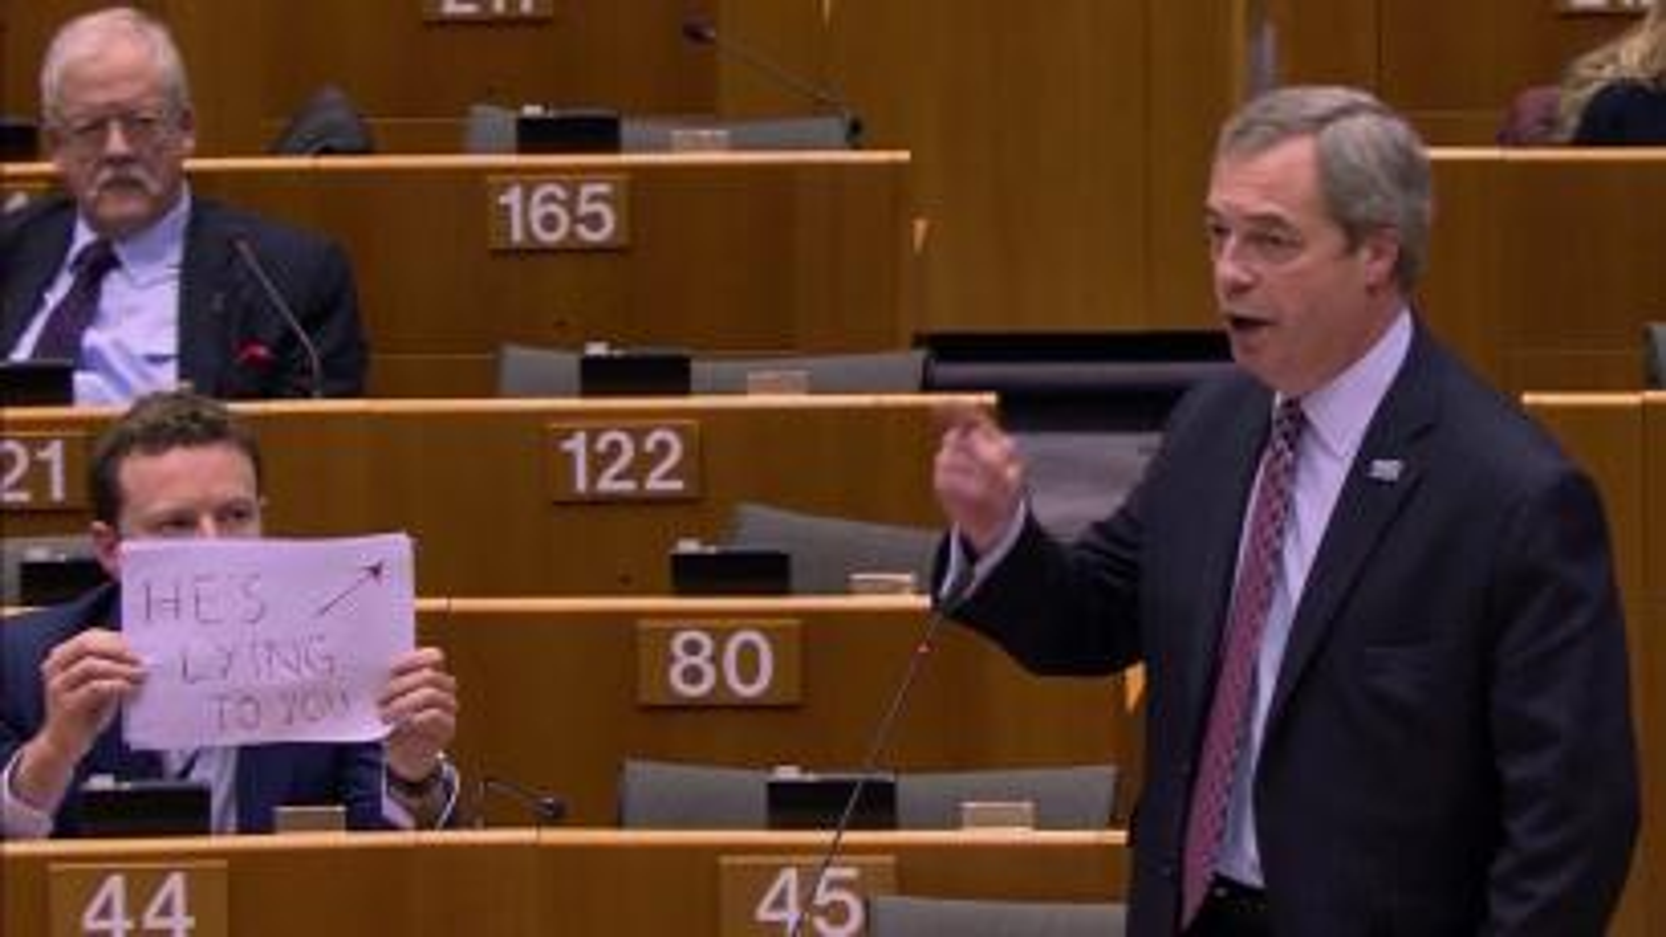 Seb Dance tells Nigel Farage that Trump is lying to him